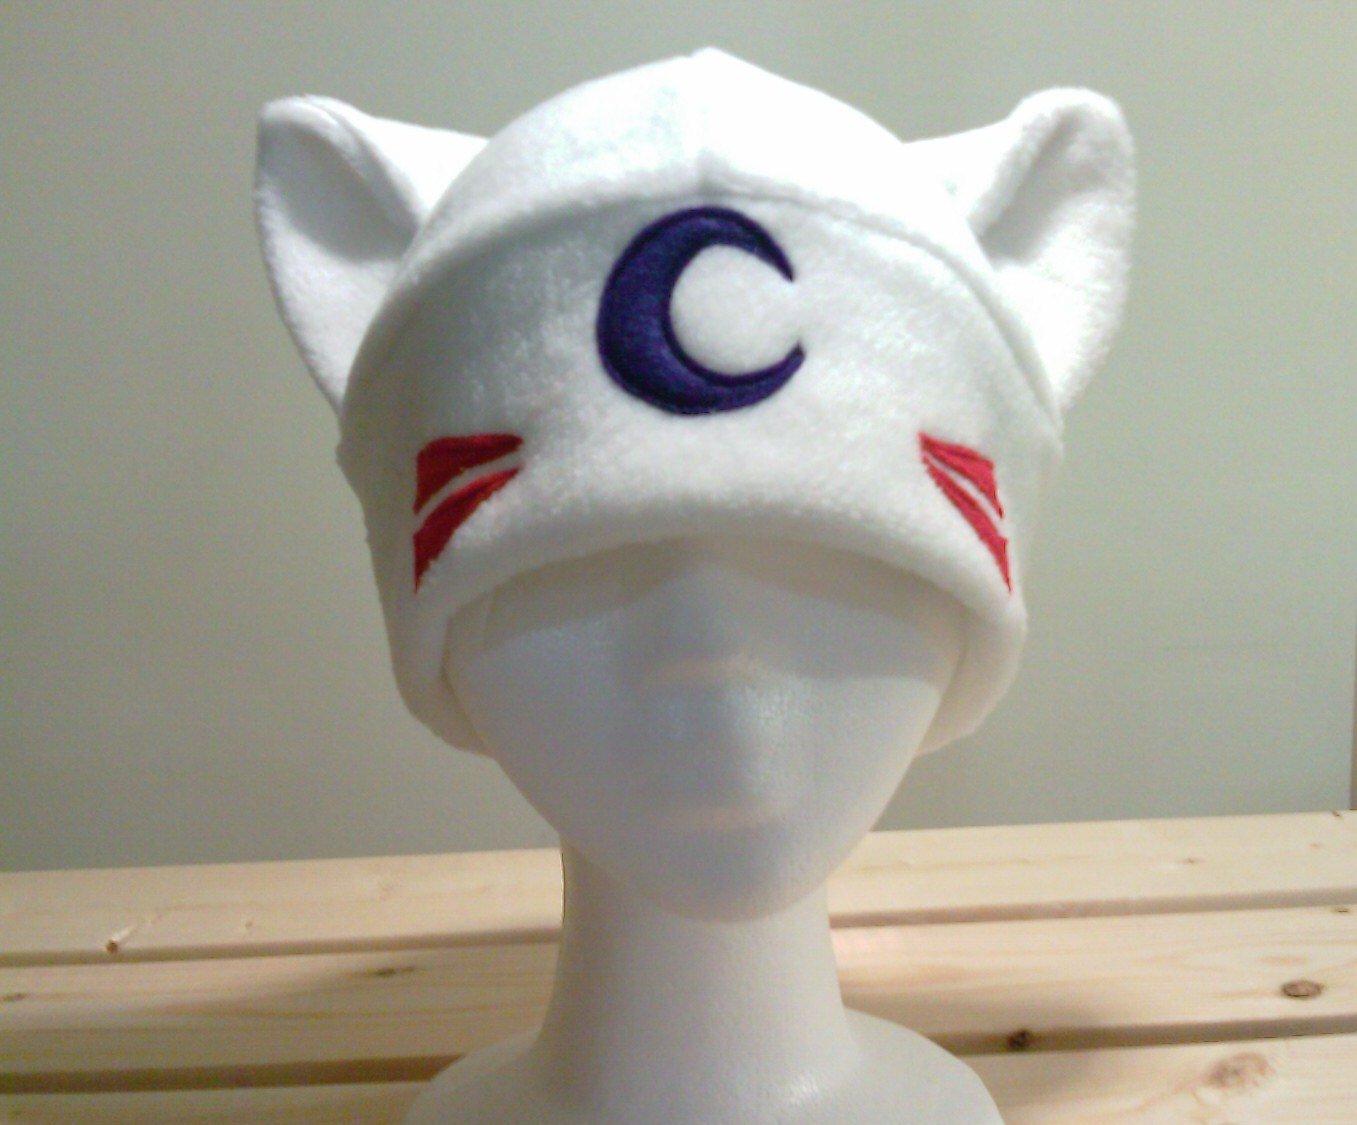 Inuyasha Cosplay - Inuyasha Costume - Inuyasha Hat - Sesshomaru Hat - Dog Ears - Dog Ear Hat - Dog Fleece Hat - Cosplay Hat - Dog Anime hat